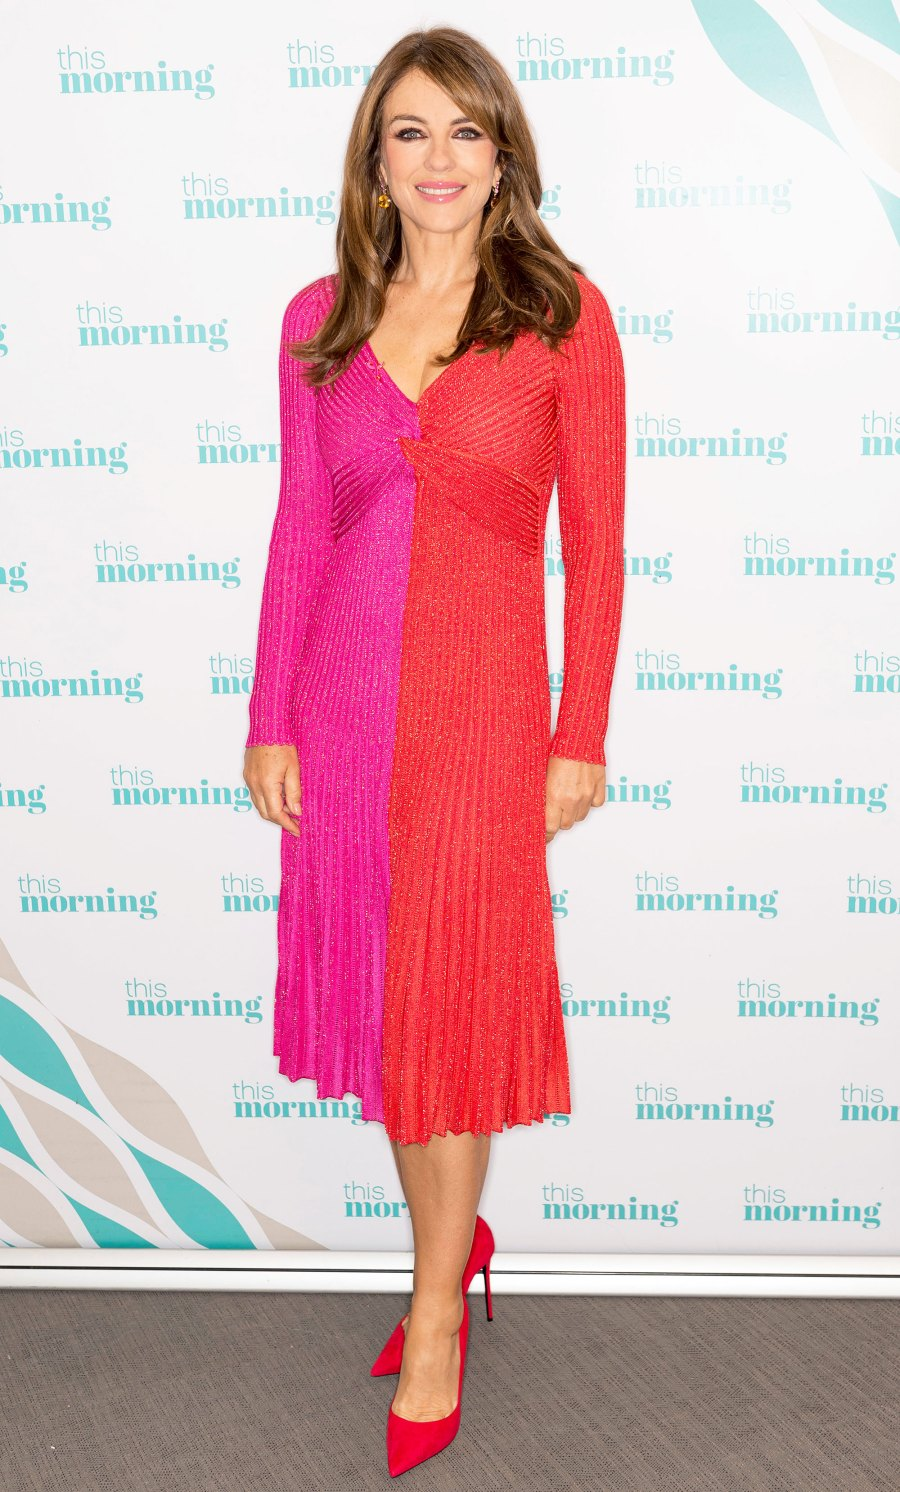 Celebs Wearing Red and Pink - Elizabeth Hurley